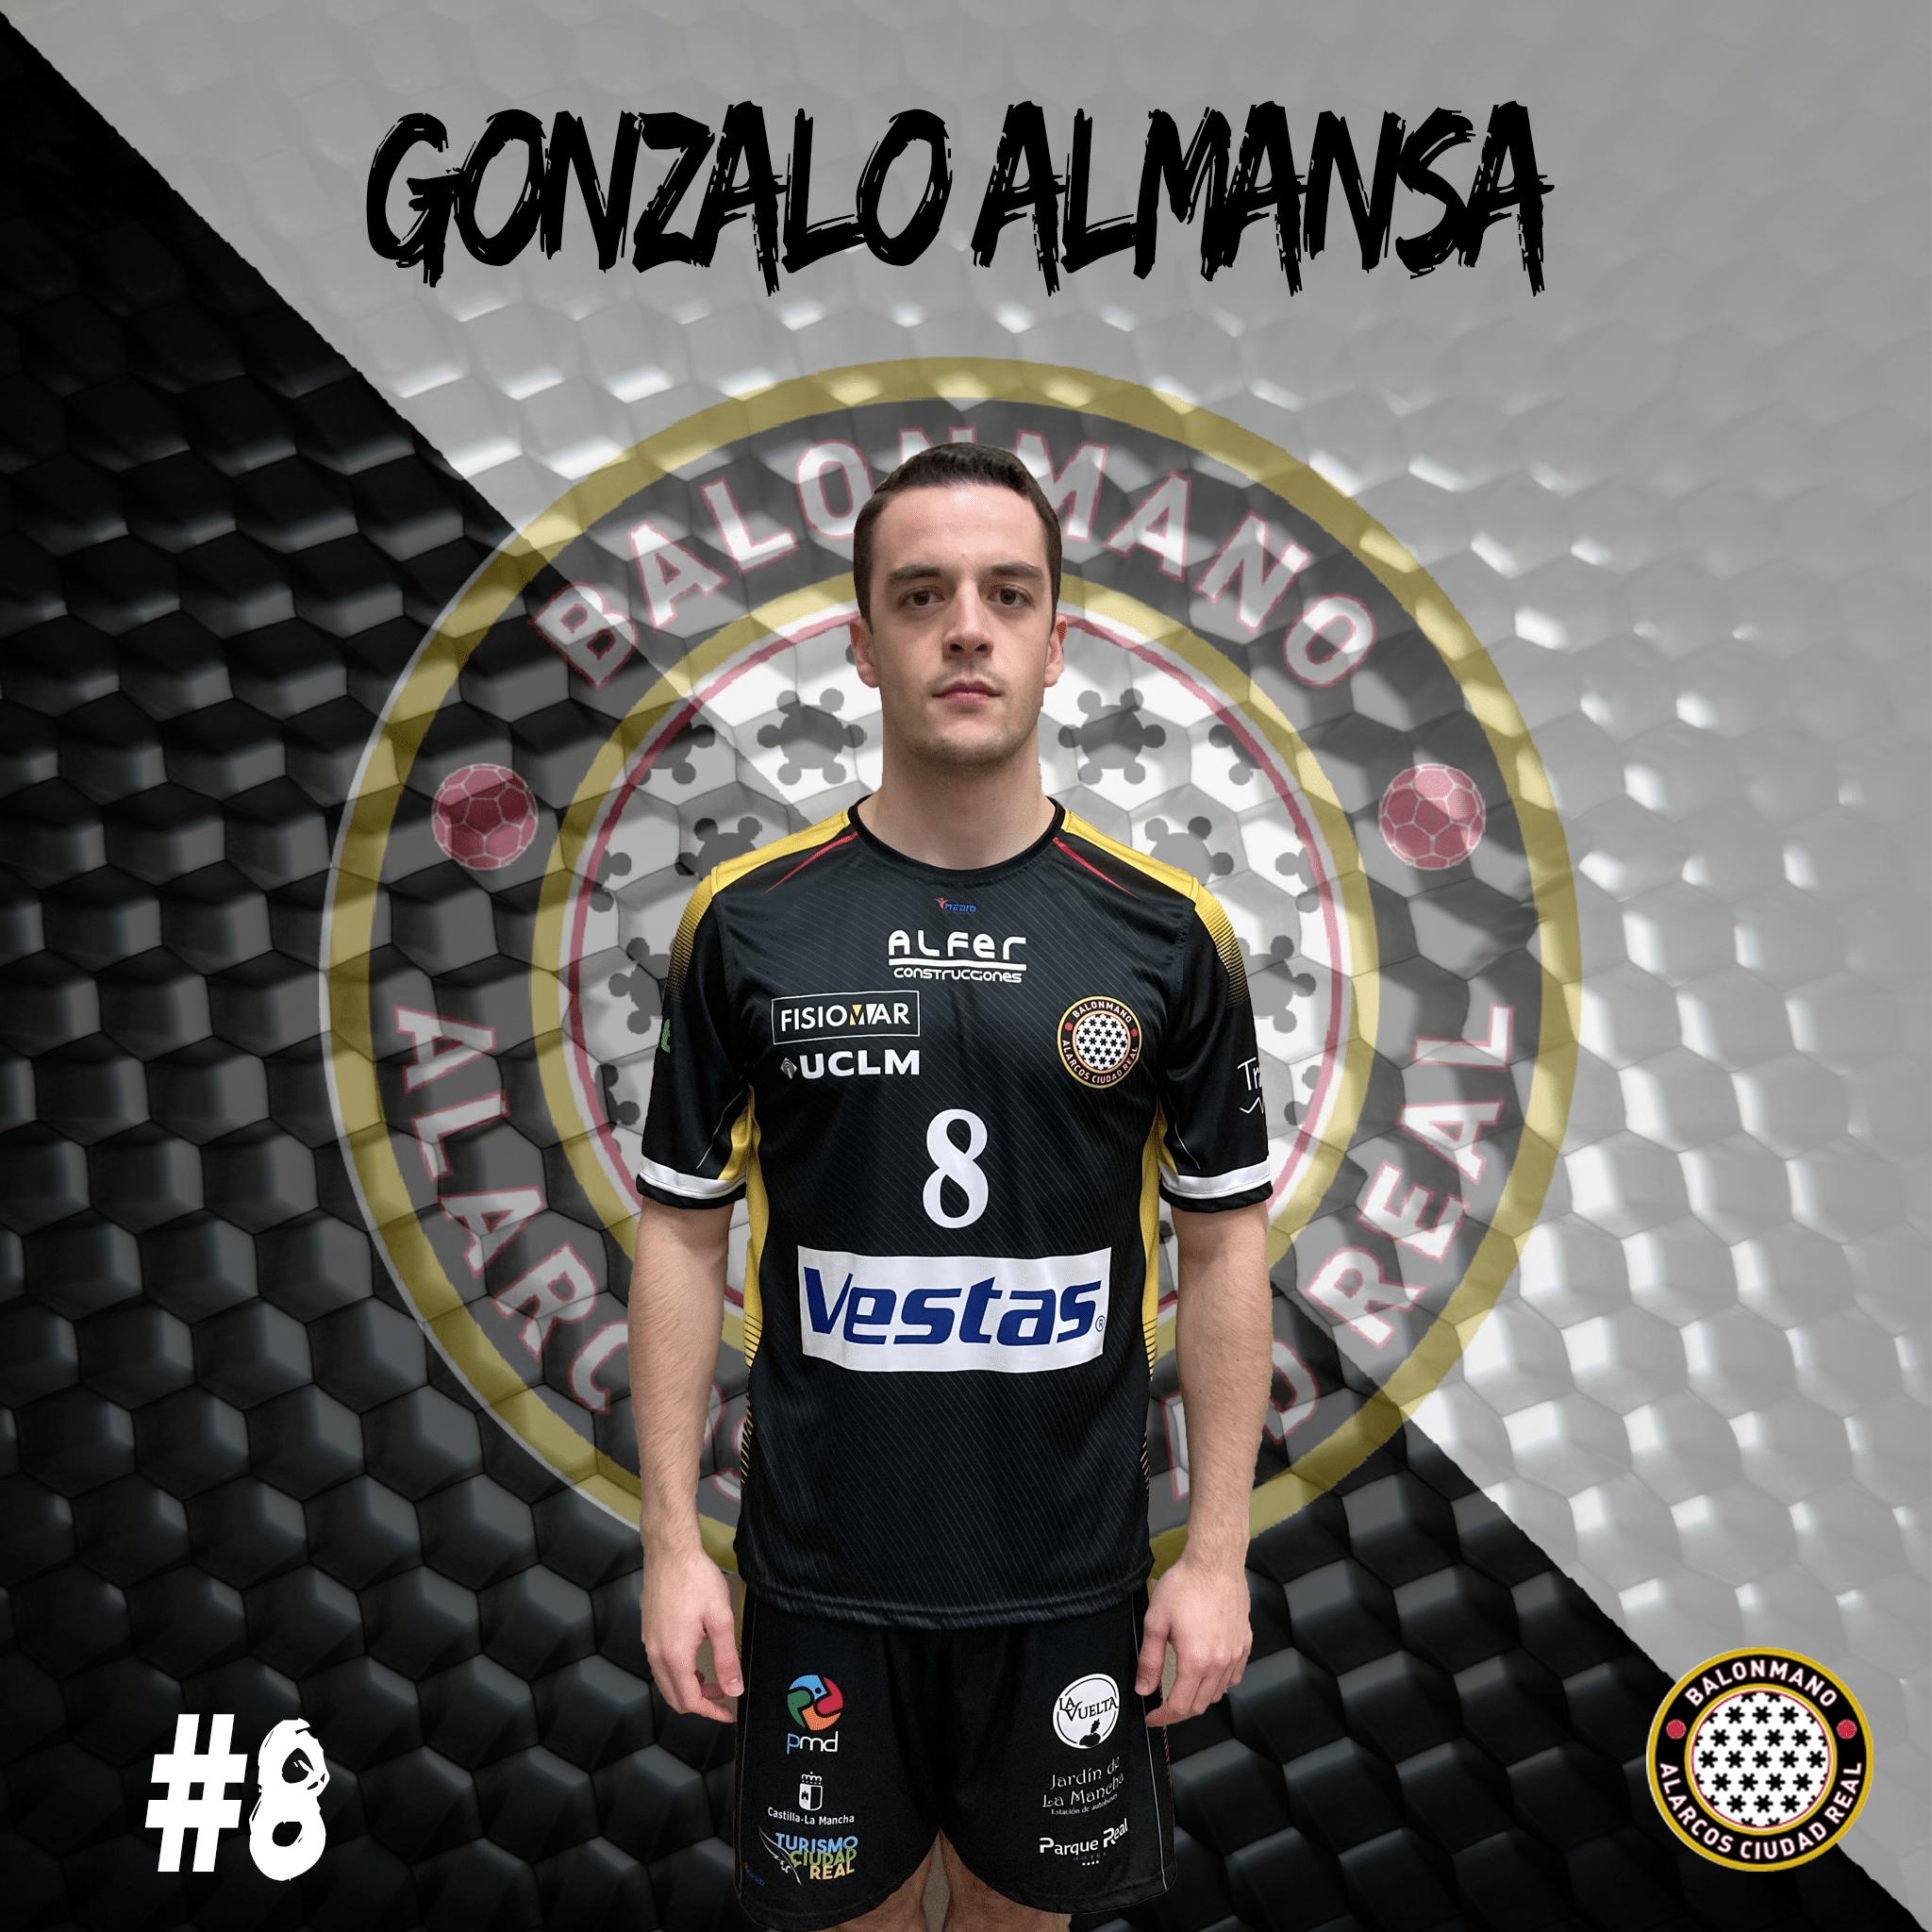 8. GONZALO ALMANSA